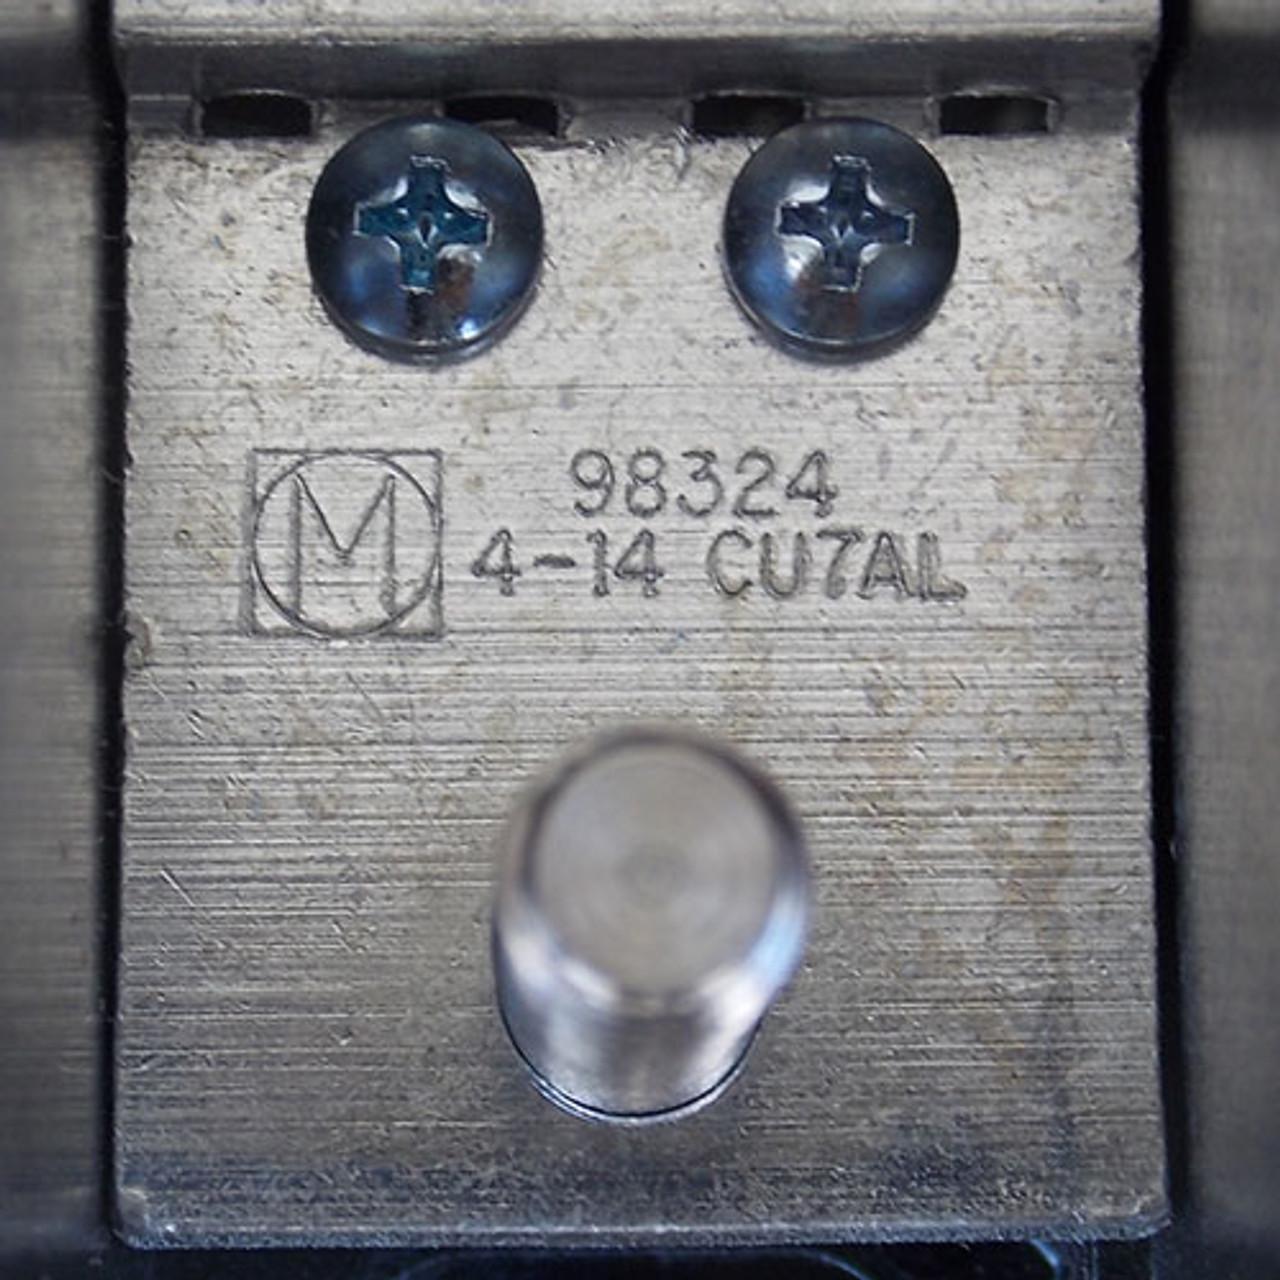 Marathon 1332273CH 2 Pole 510 Amp 600V Power Distribution Block - New